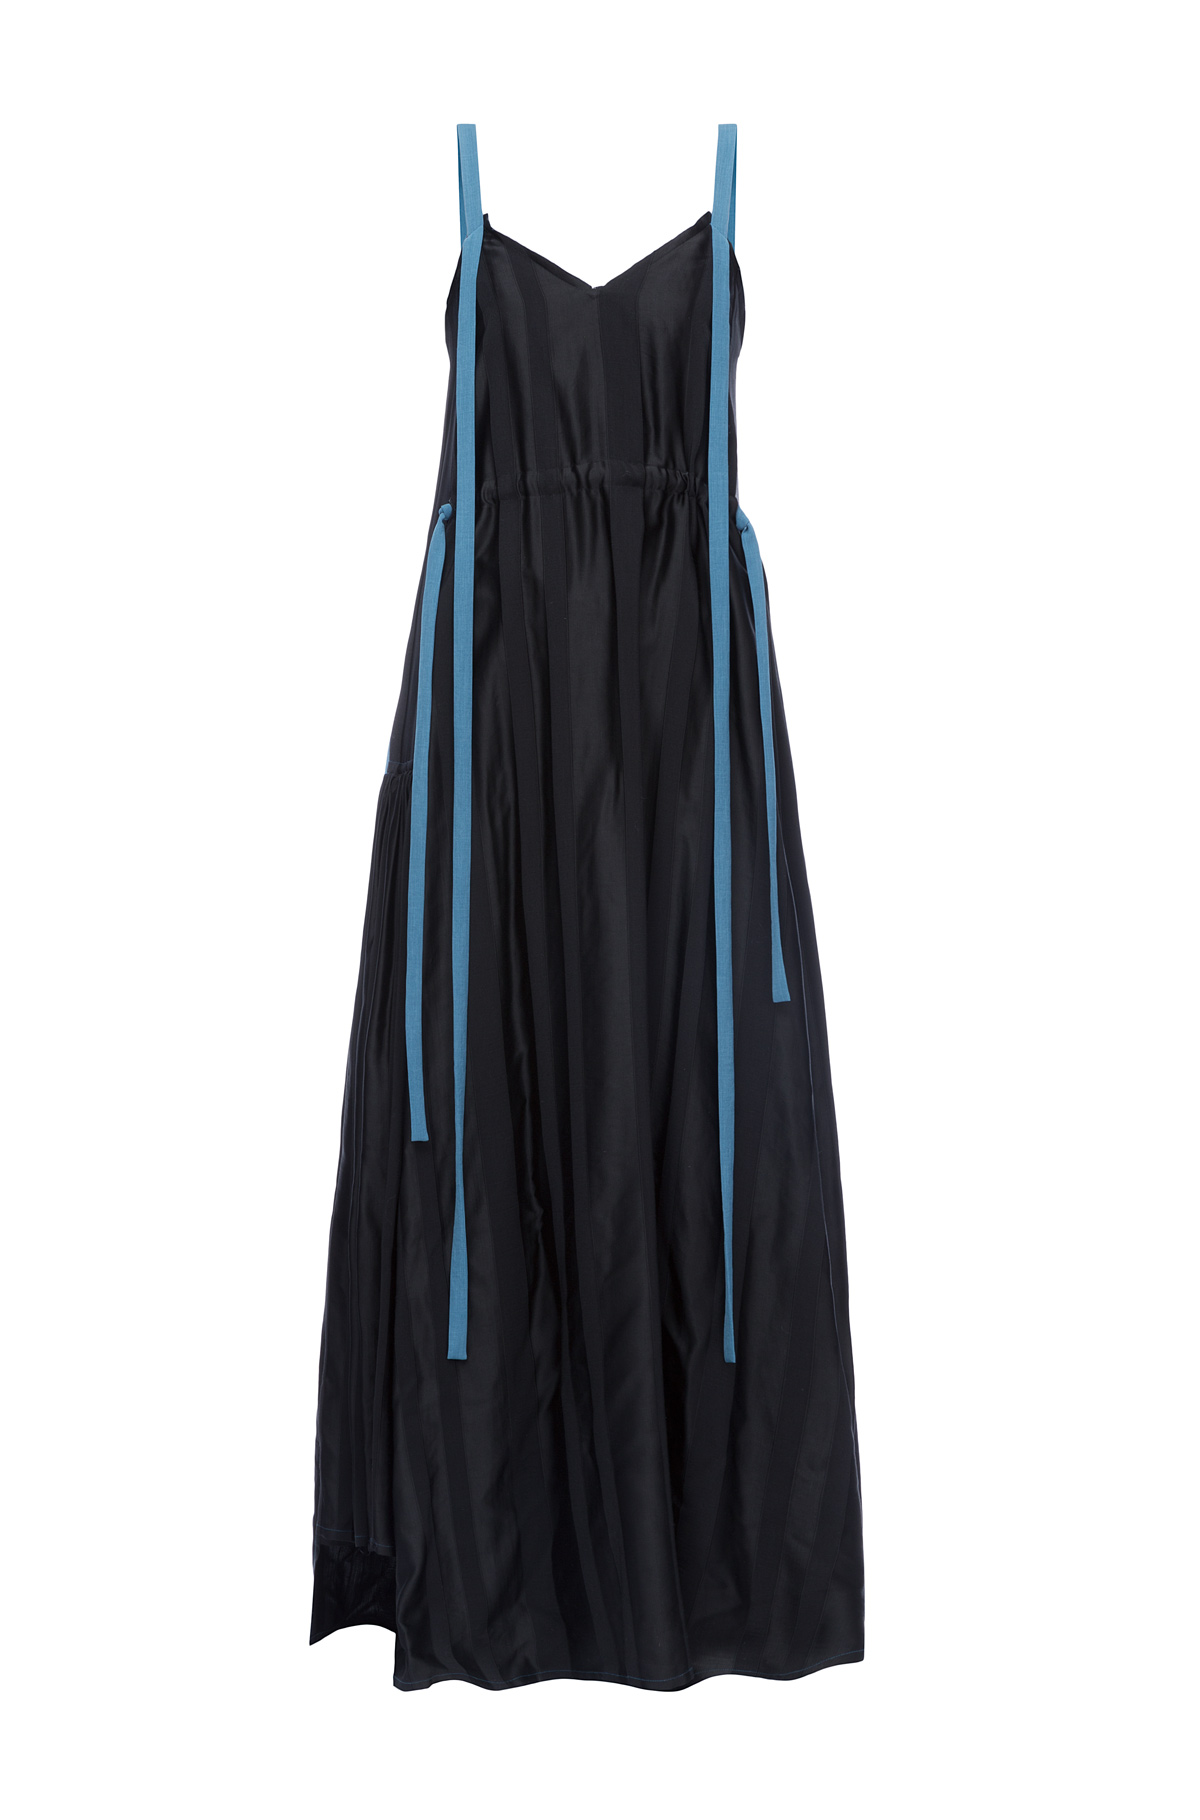 LOEWE Camisole Dress Blue Trims Black/Blue front